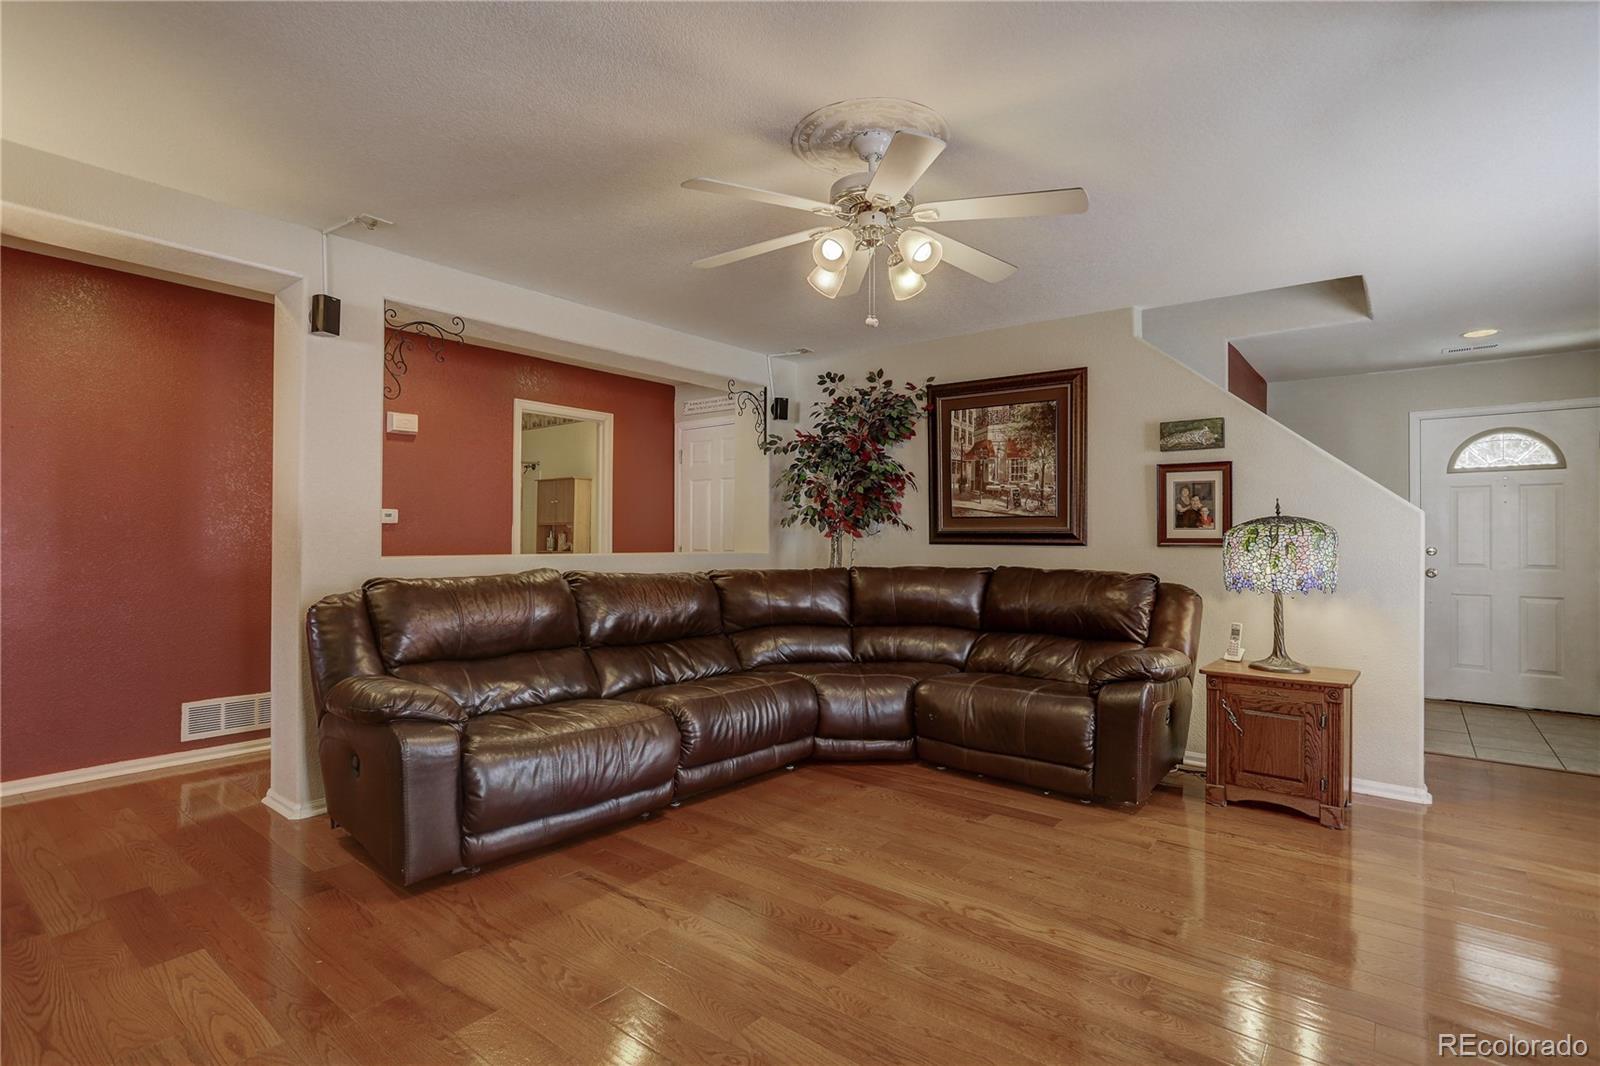 MLS# 9568264 - 9 - 7346 Marmot Ridge Place, Littleton, CO 80125